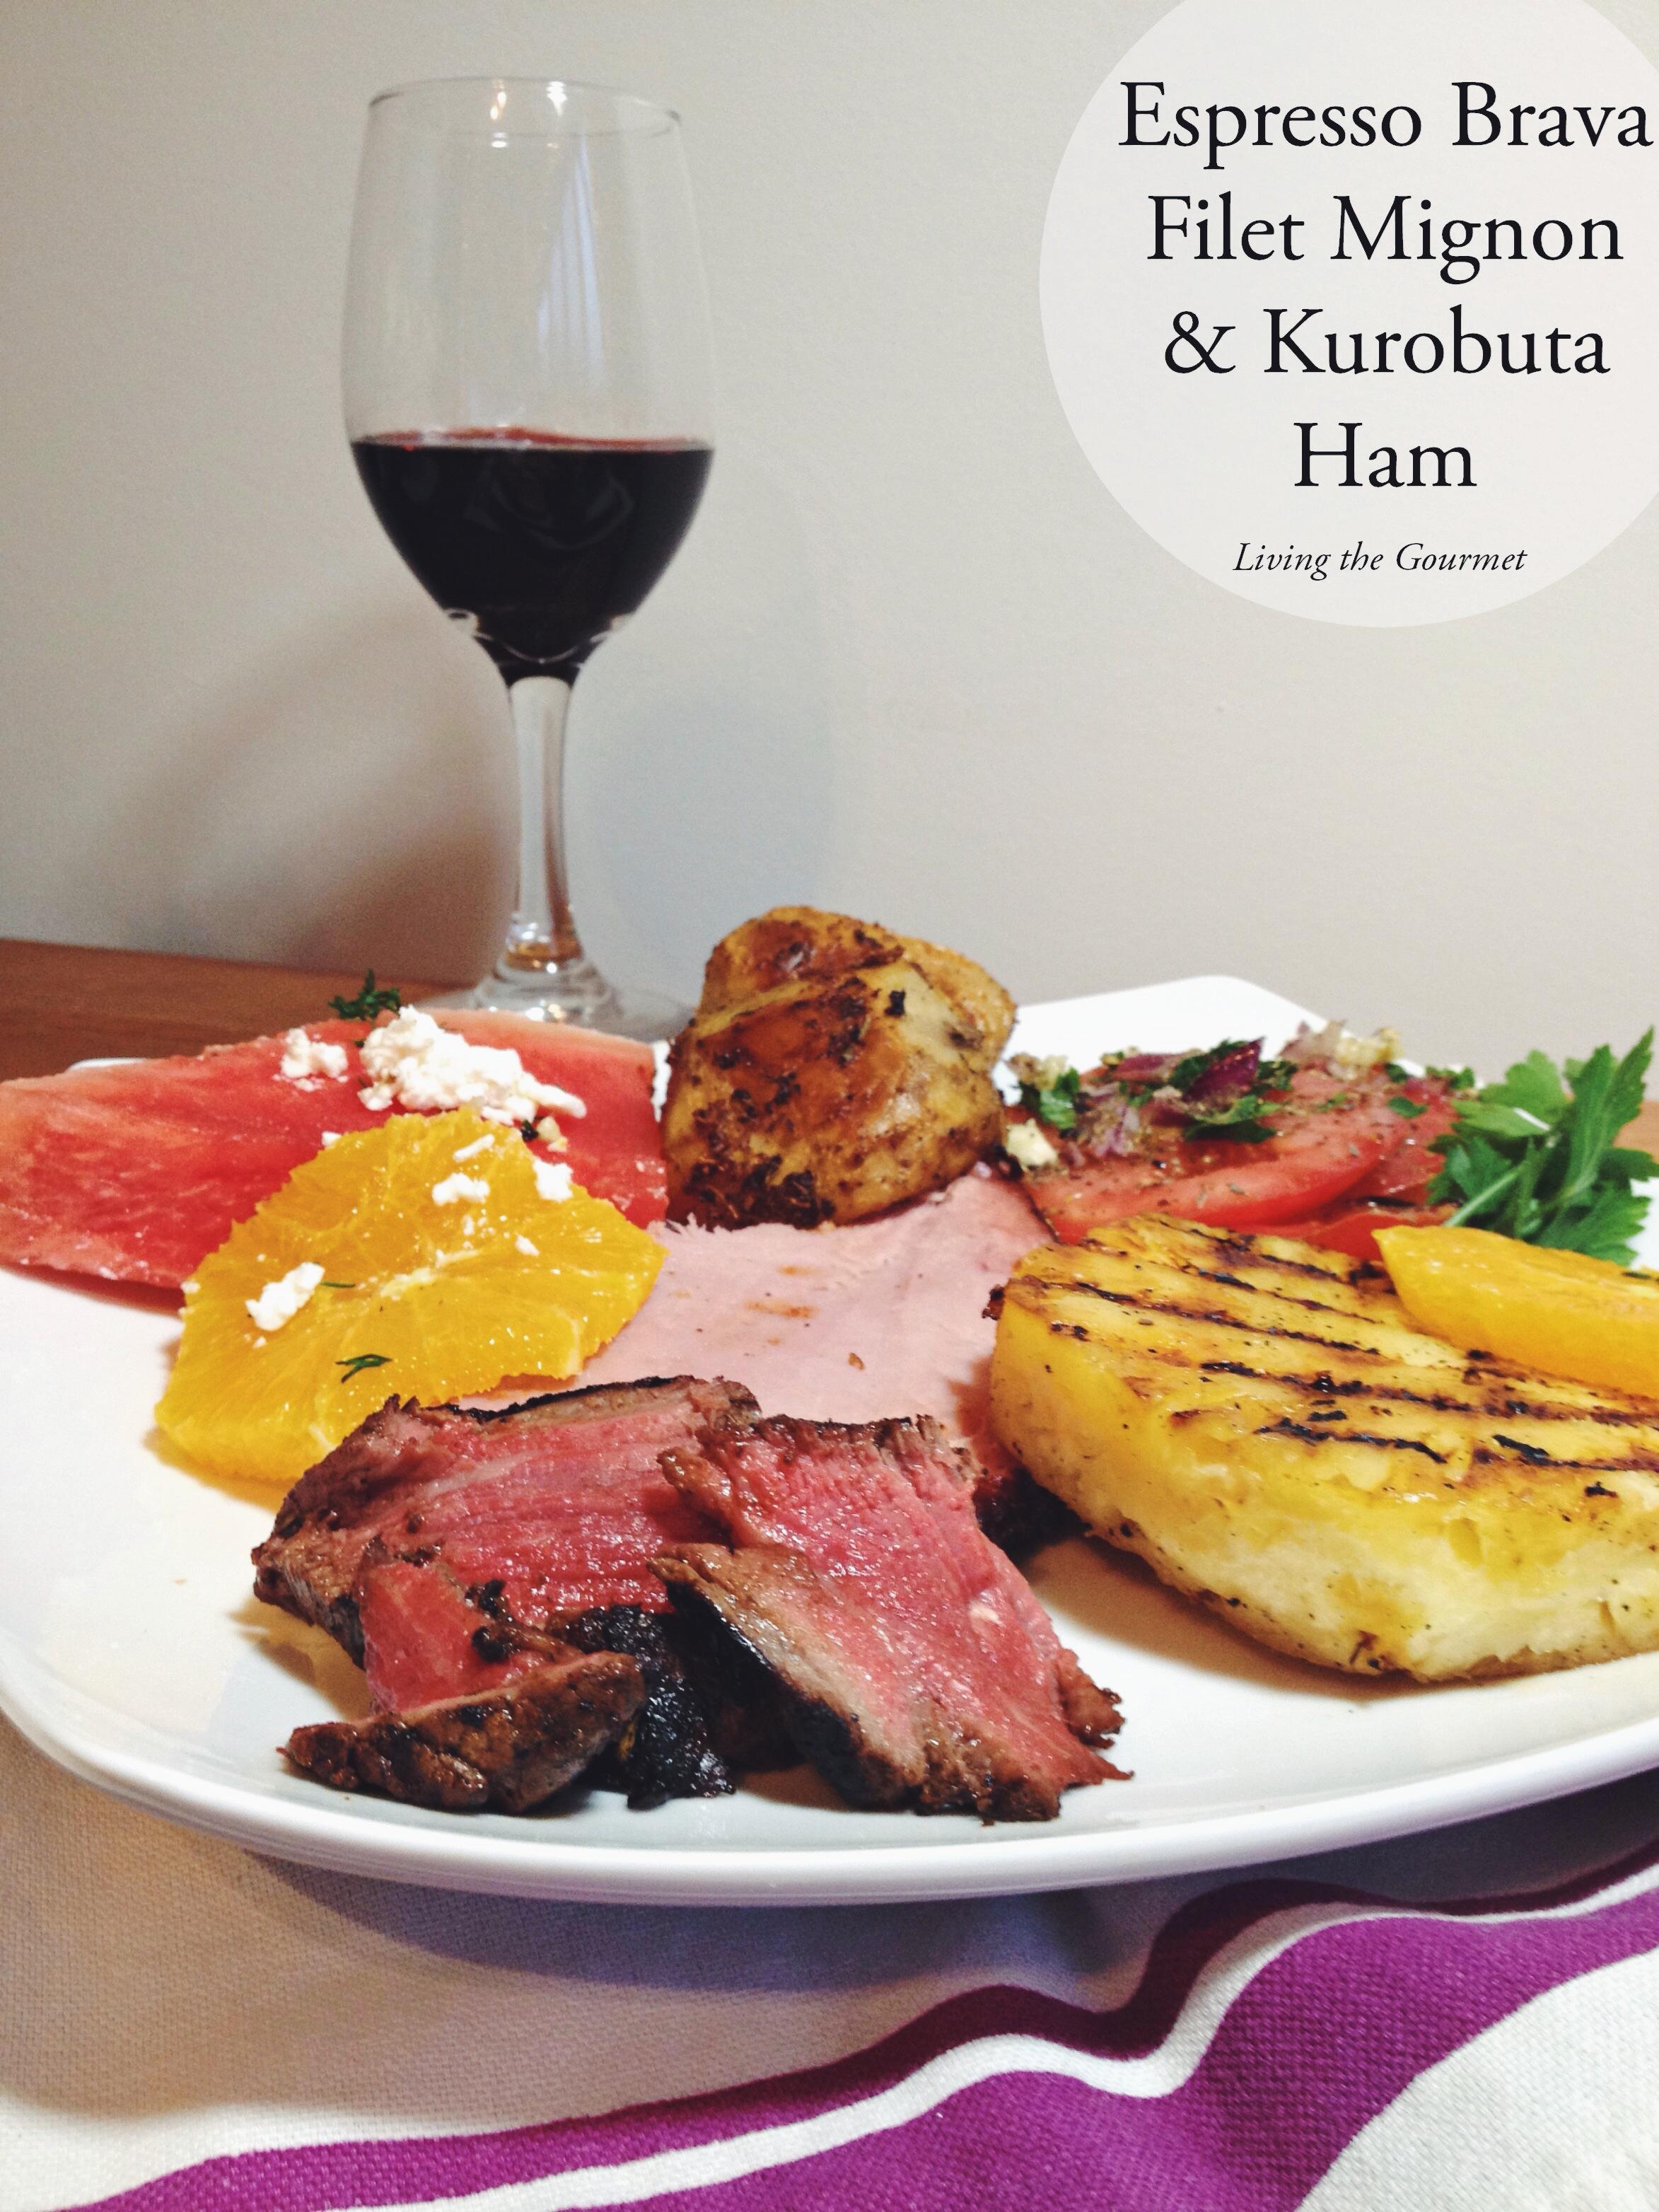 Living the Gourmet: Espresso Brava Filet Mignon & Kurobuta Ham